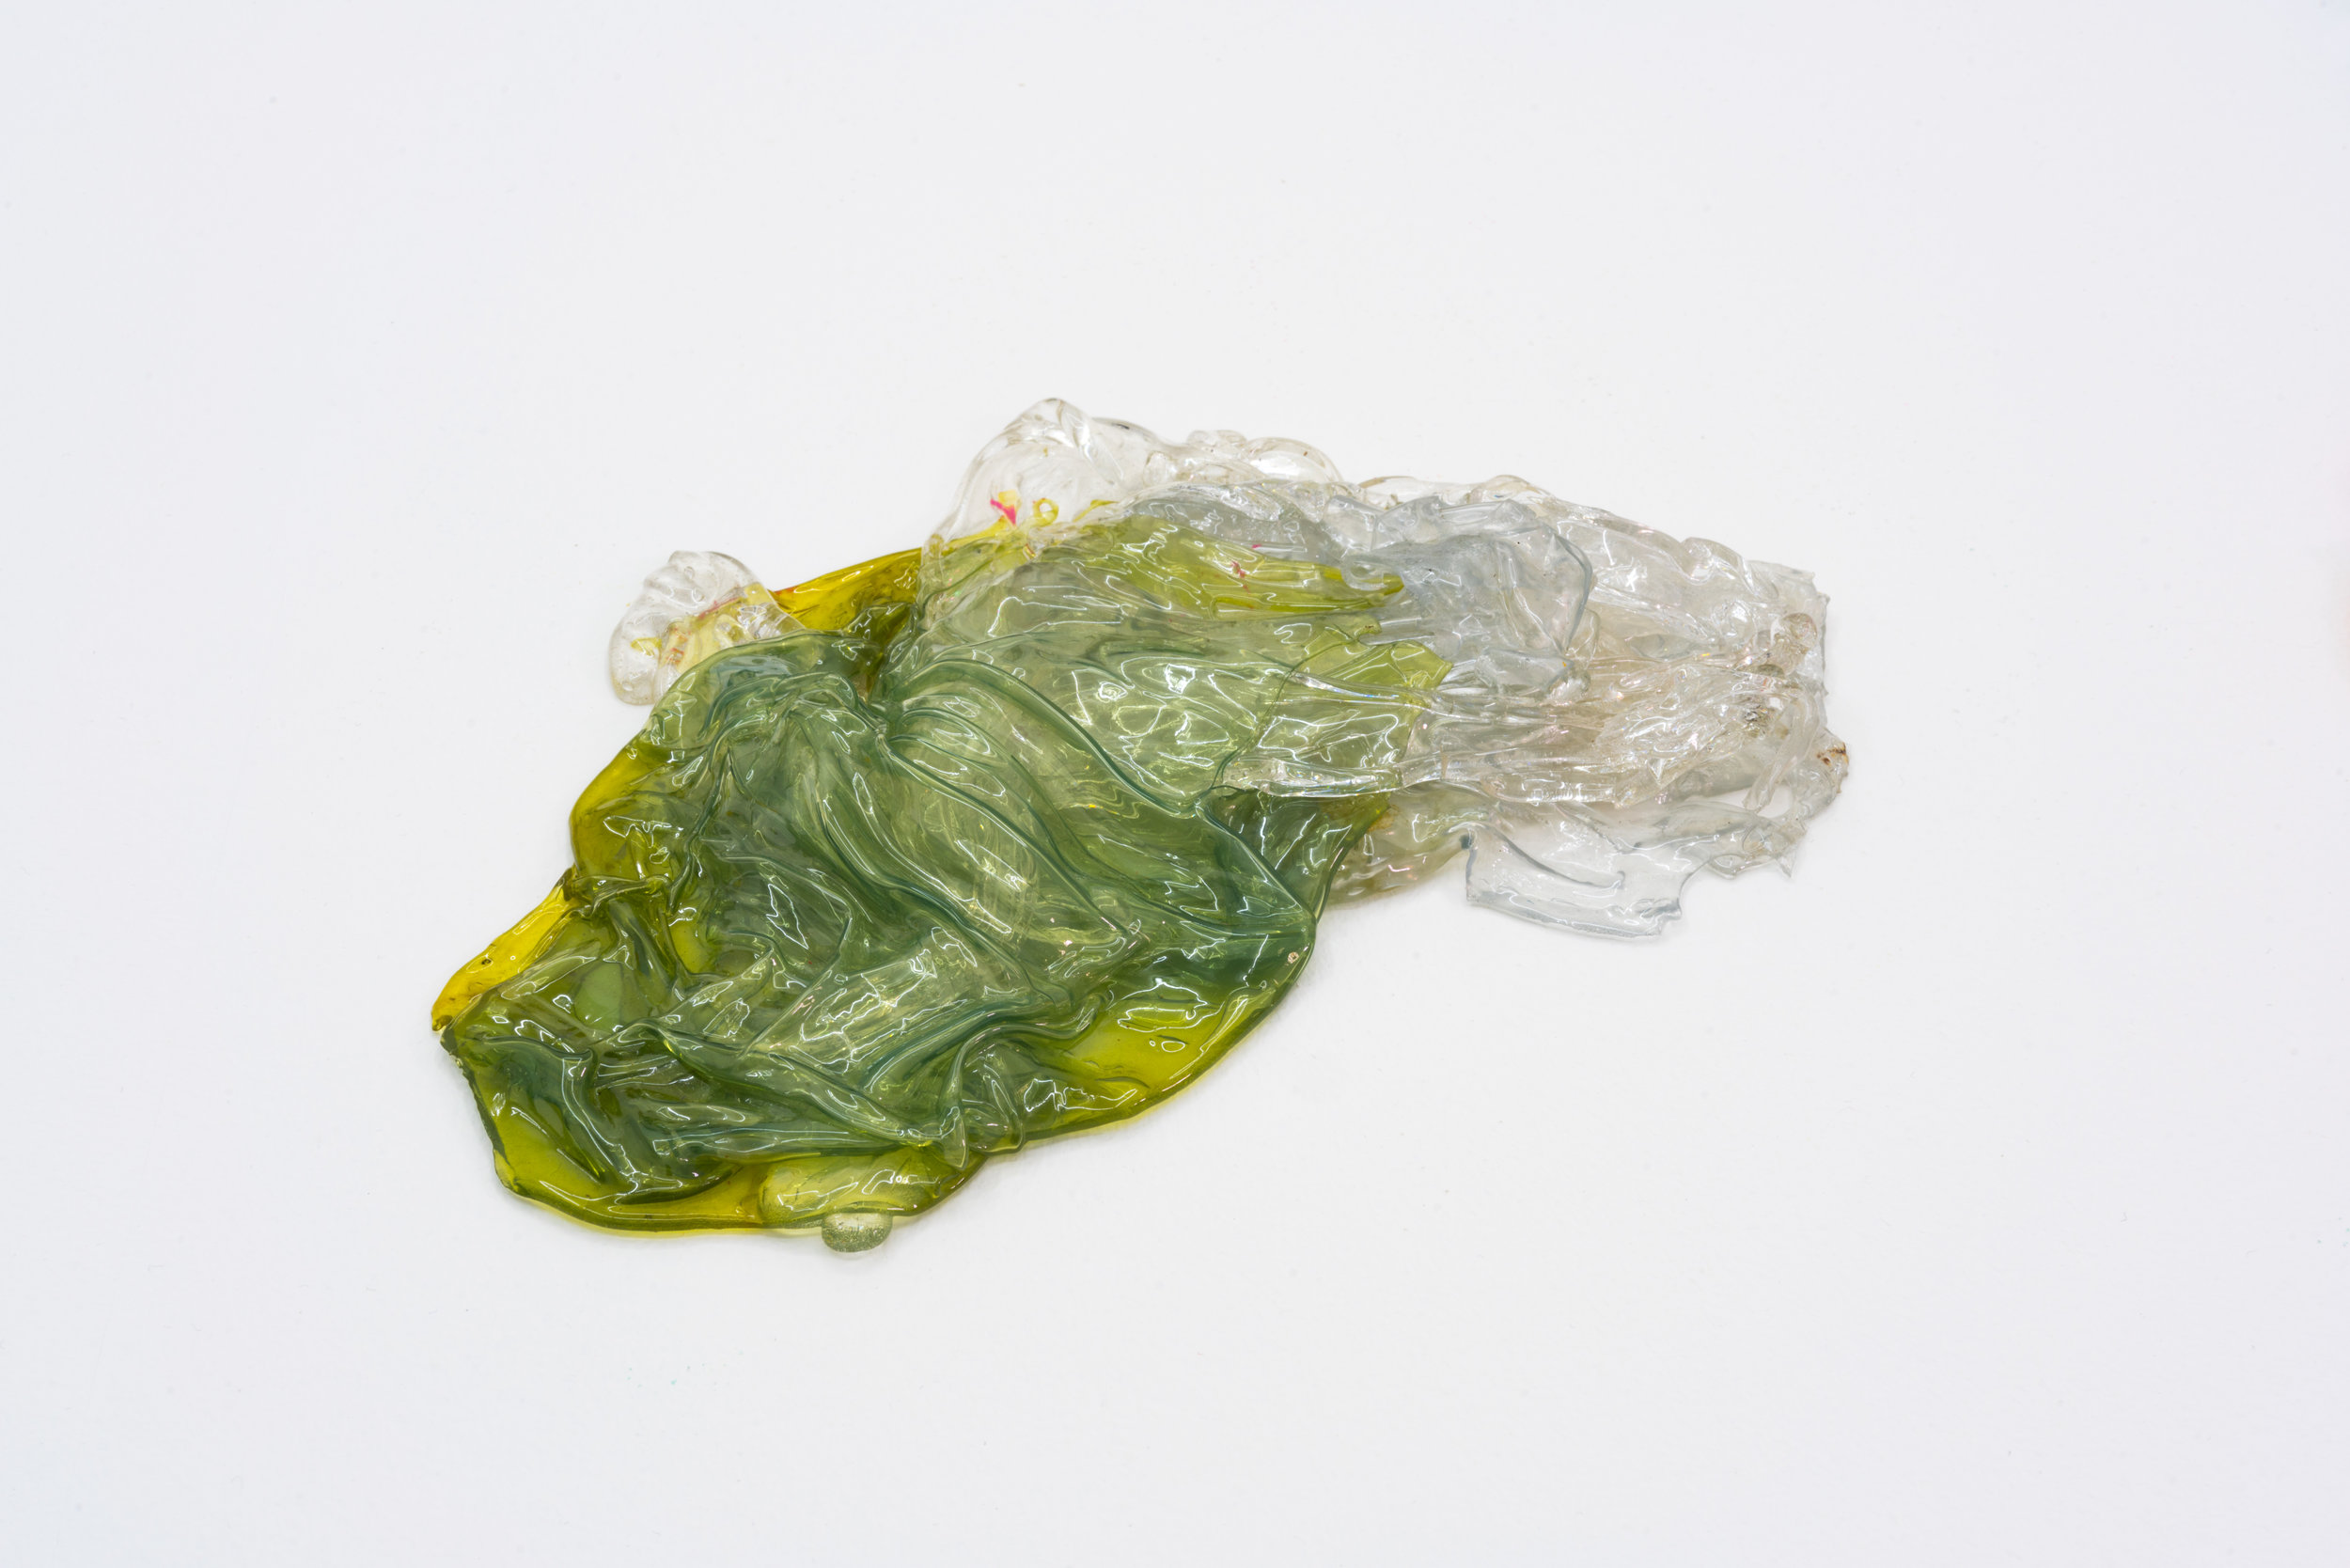 Remko Scha,  Plastic Meltdown , 1962-1992, Plastic, 2 x 21 x 14 cm